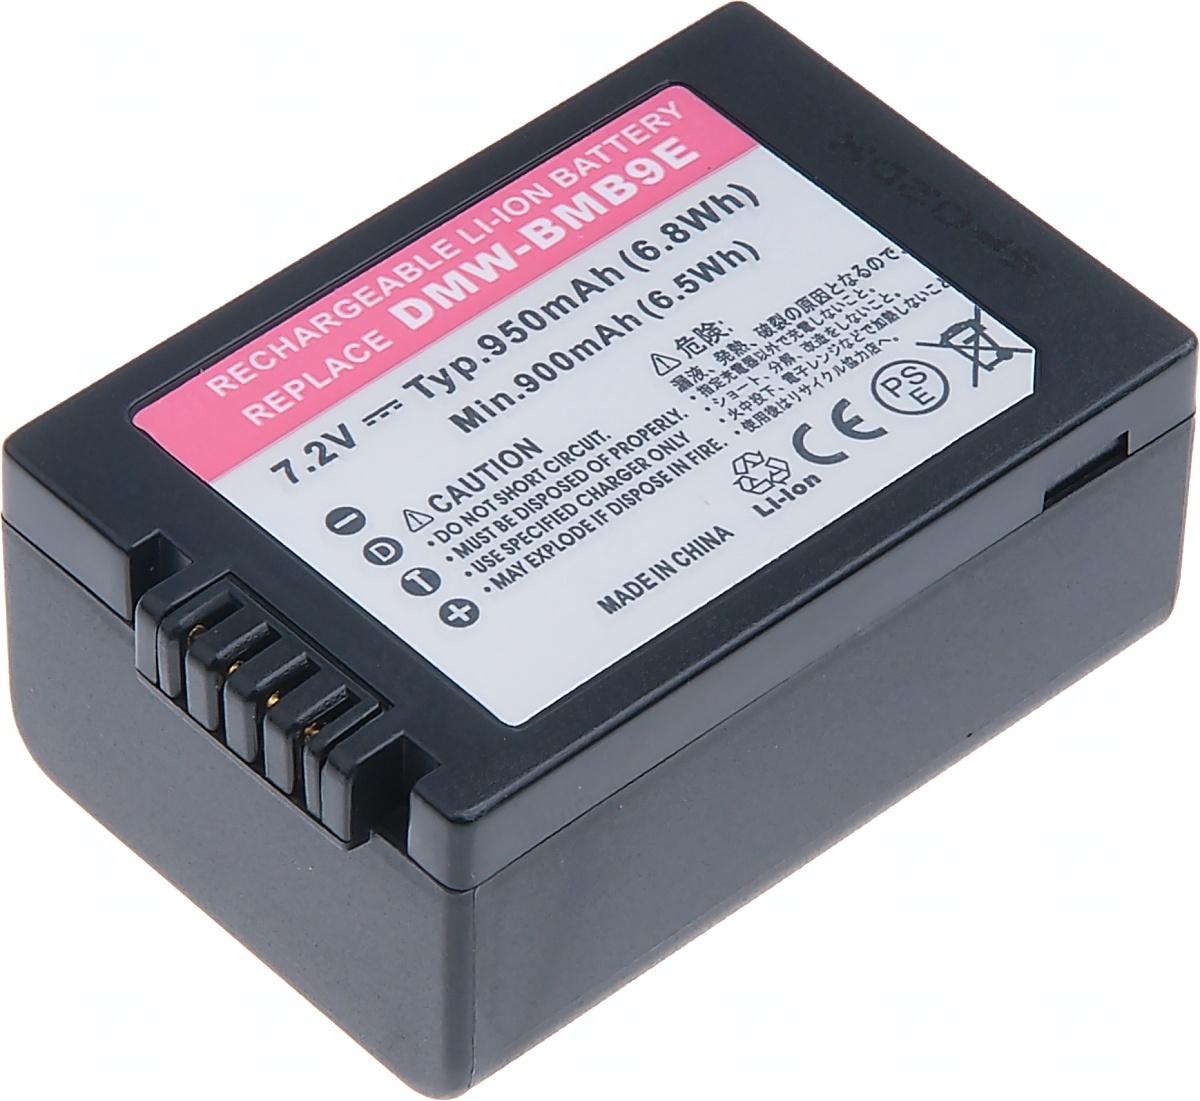 Baterie T6 power Panasonic DMW-BMB9E, 950mAh, černá (Baterie a gripy)